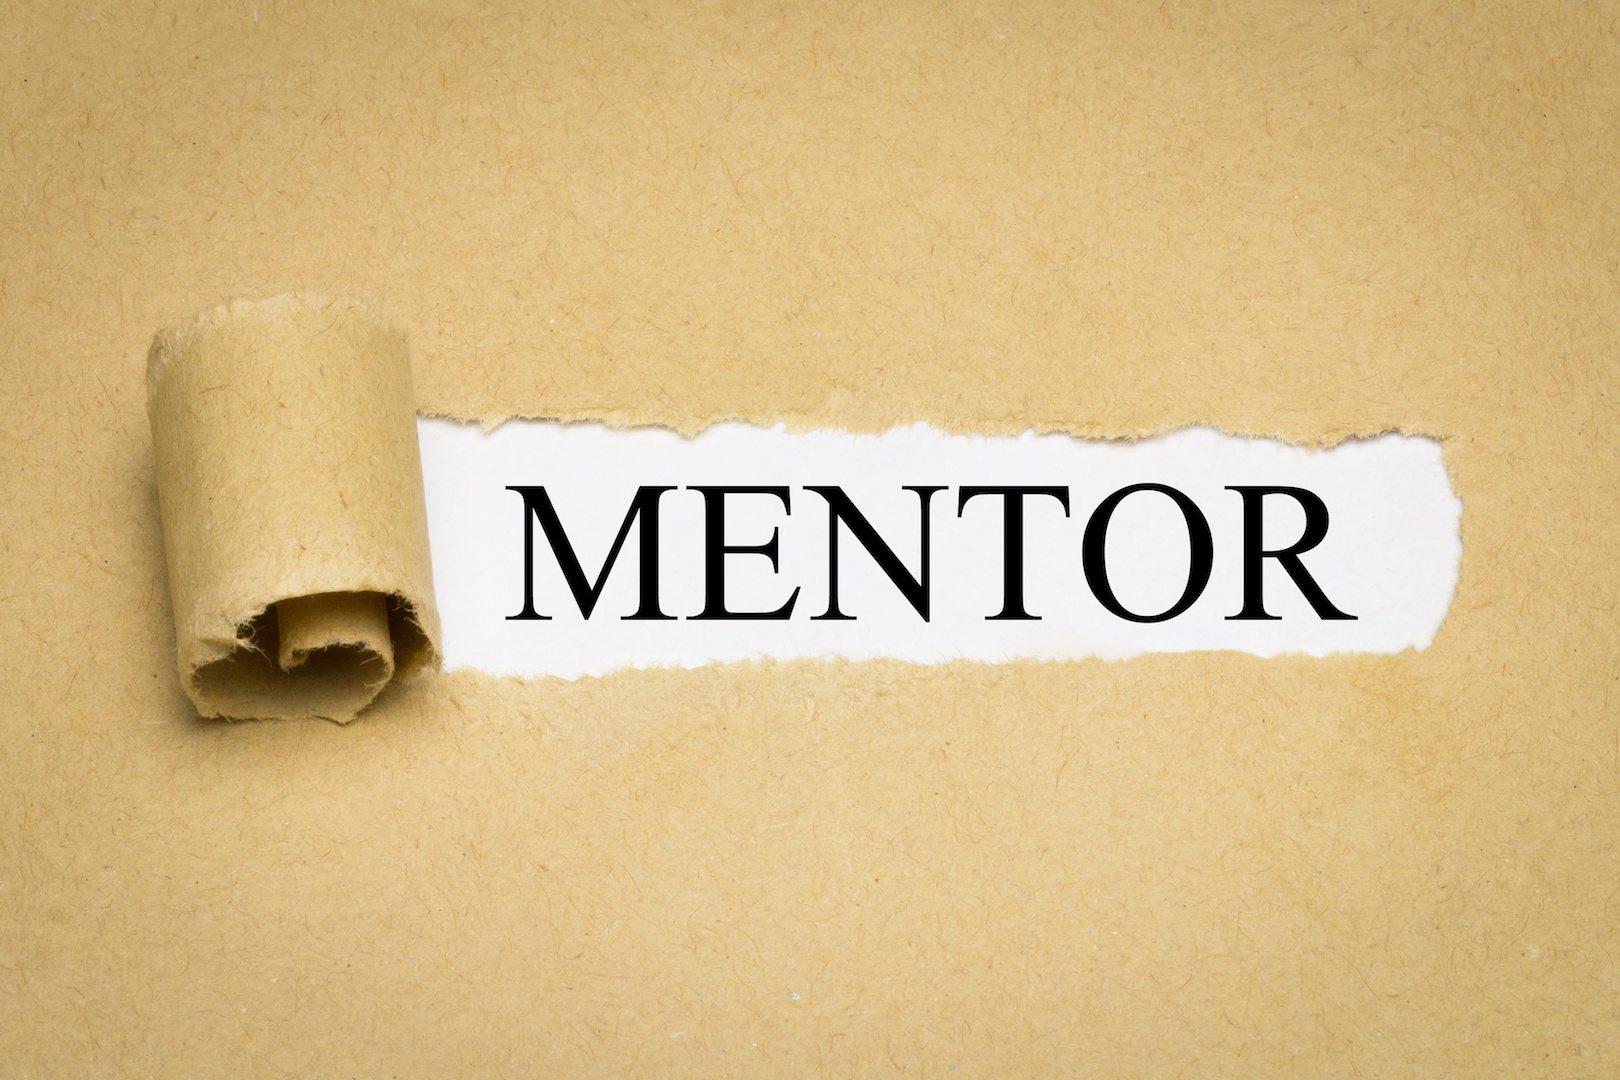 Marriage Mentor AdobeStock_144536319.jpeg